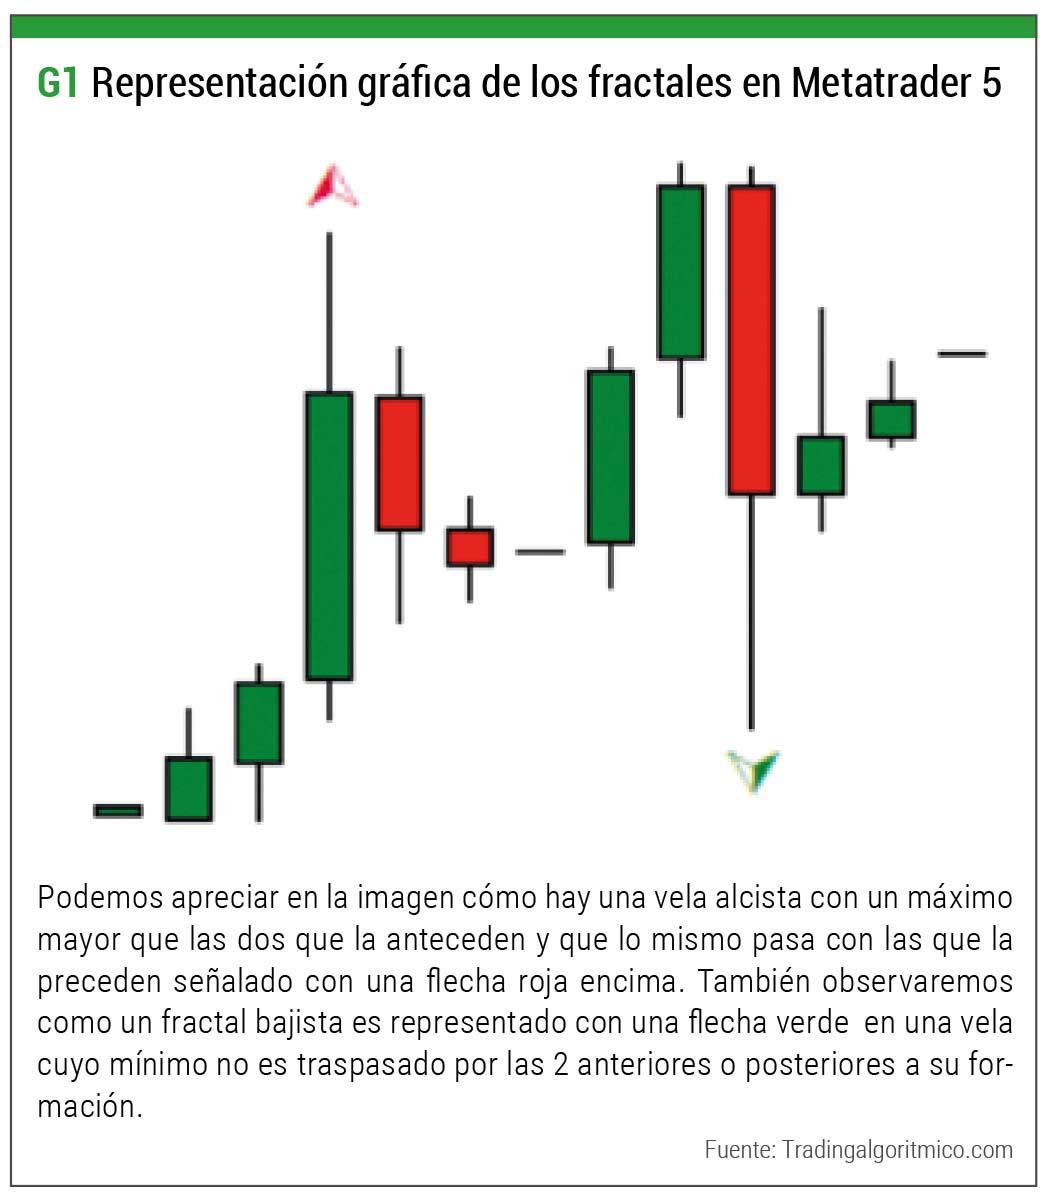 Metatrader 5 fractales